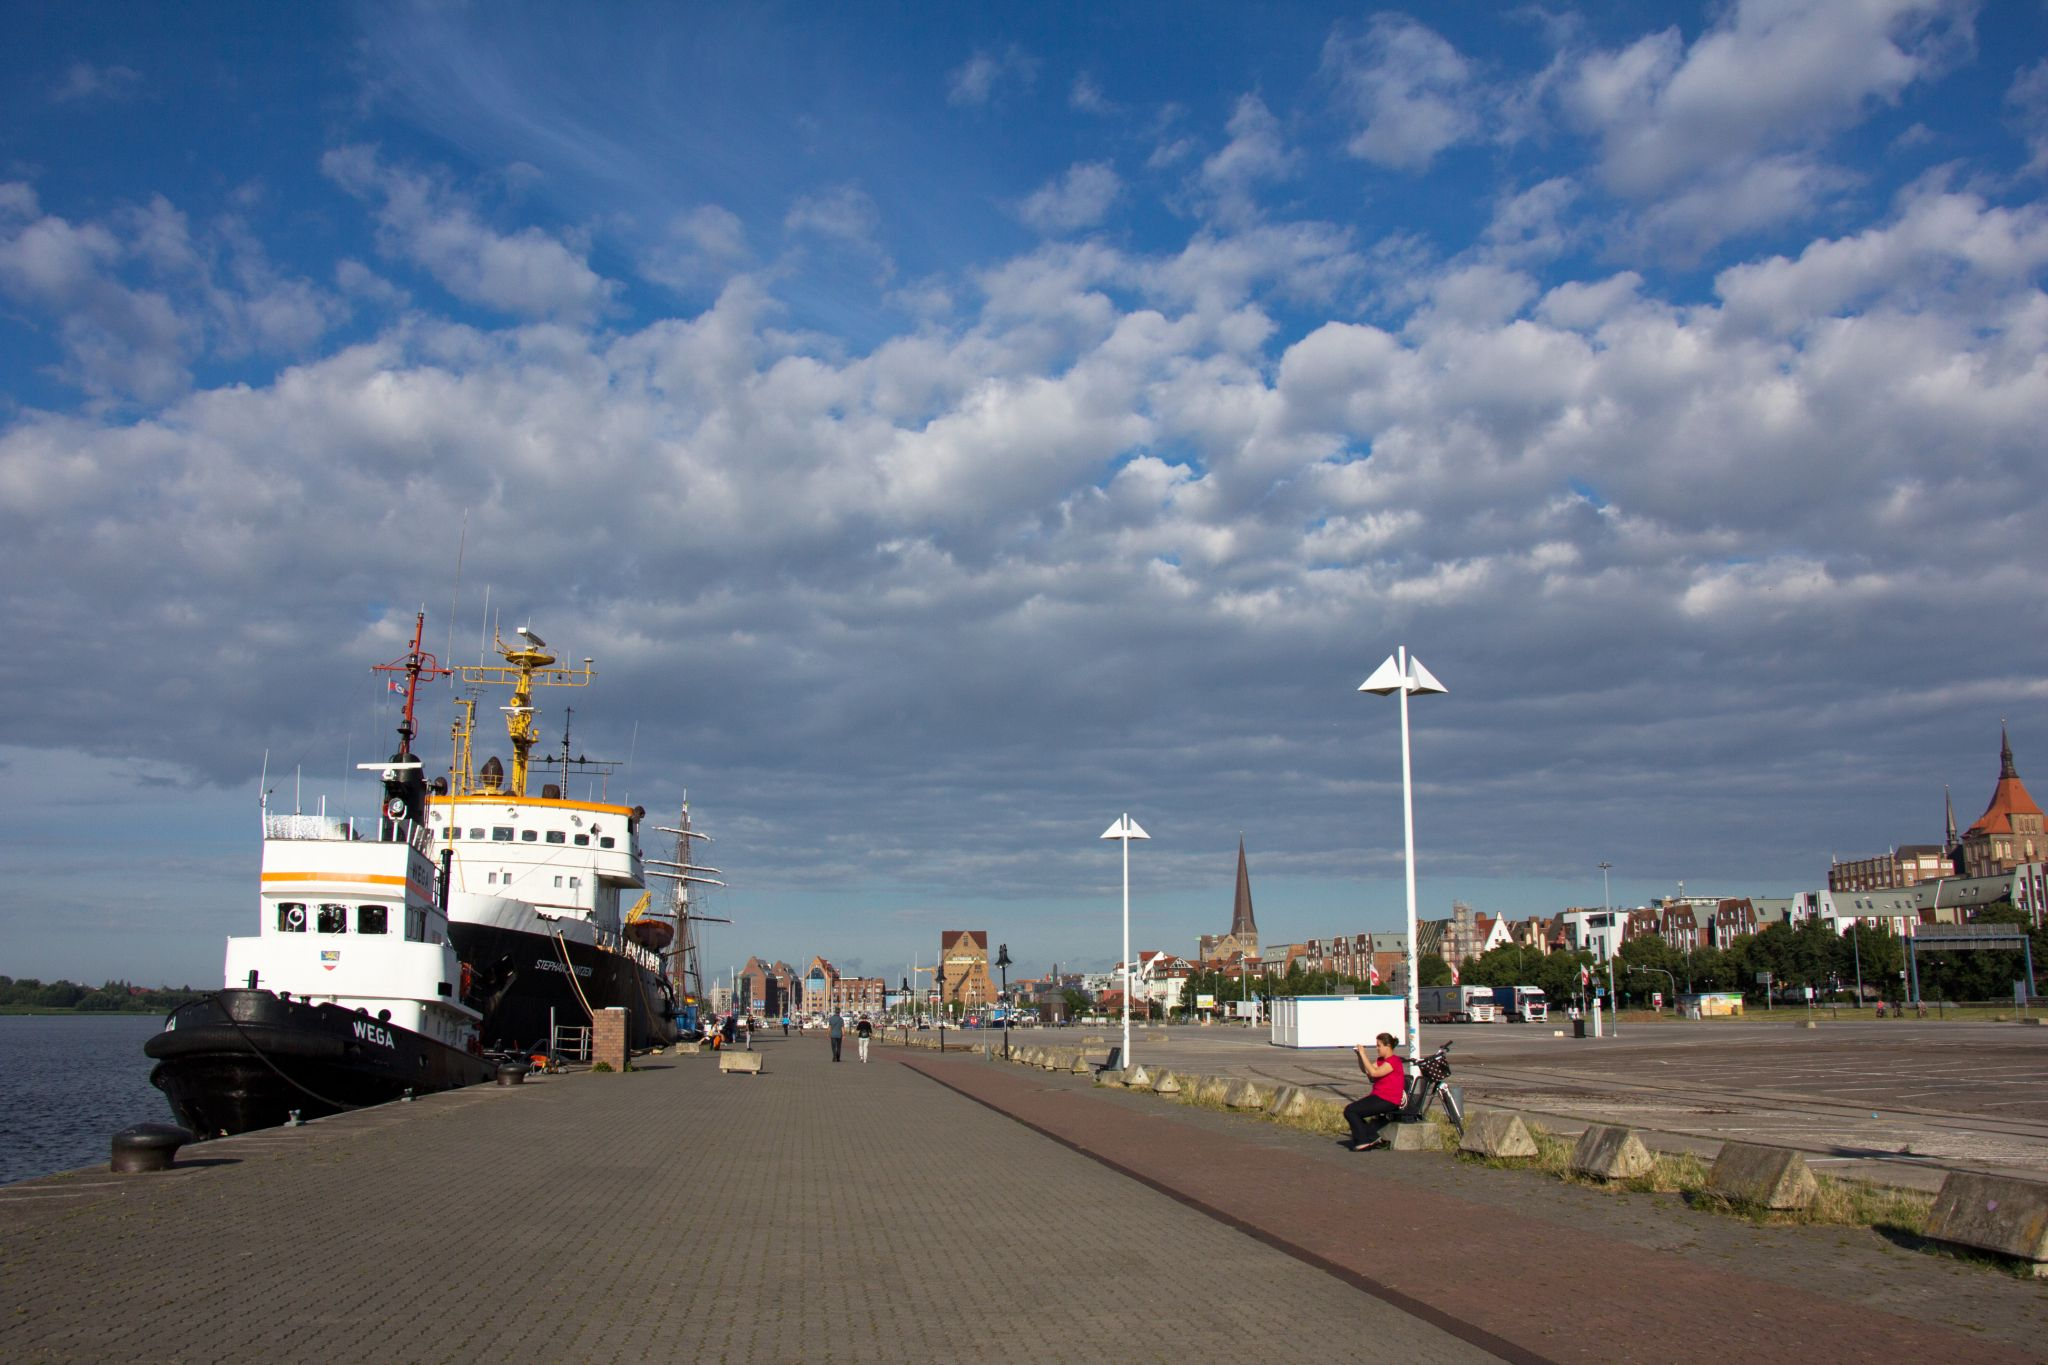 Rostock waterfront, Germany